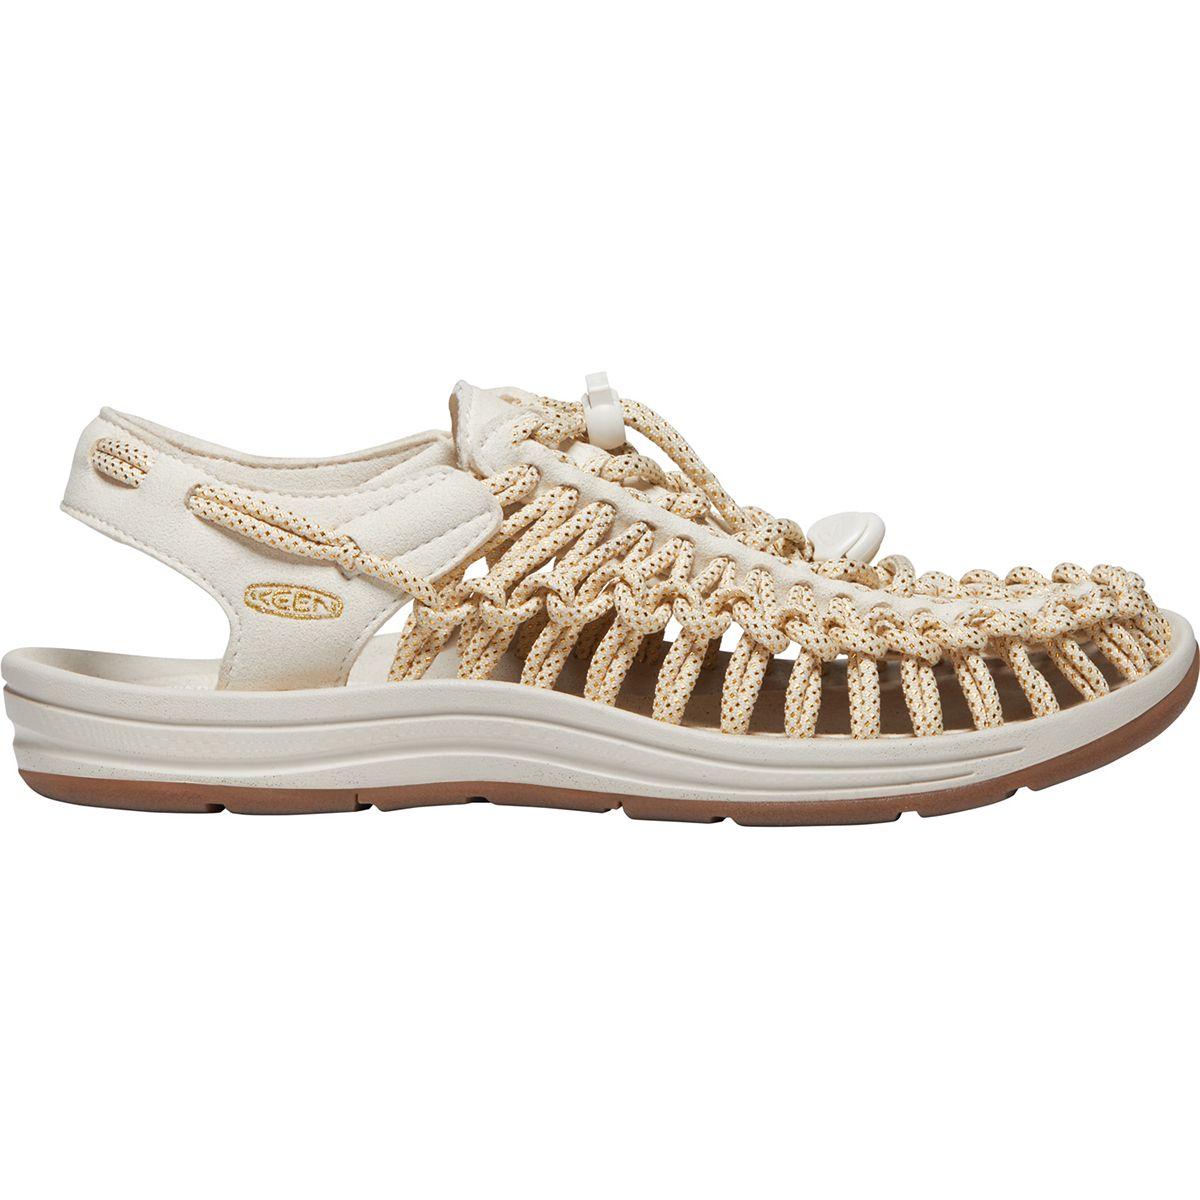 Keen UNEEK WOMEN gold/birch Velikost: 37 dámské sandály